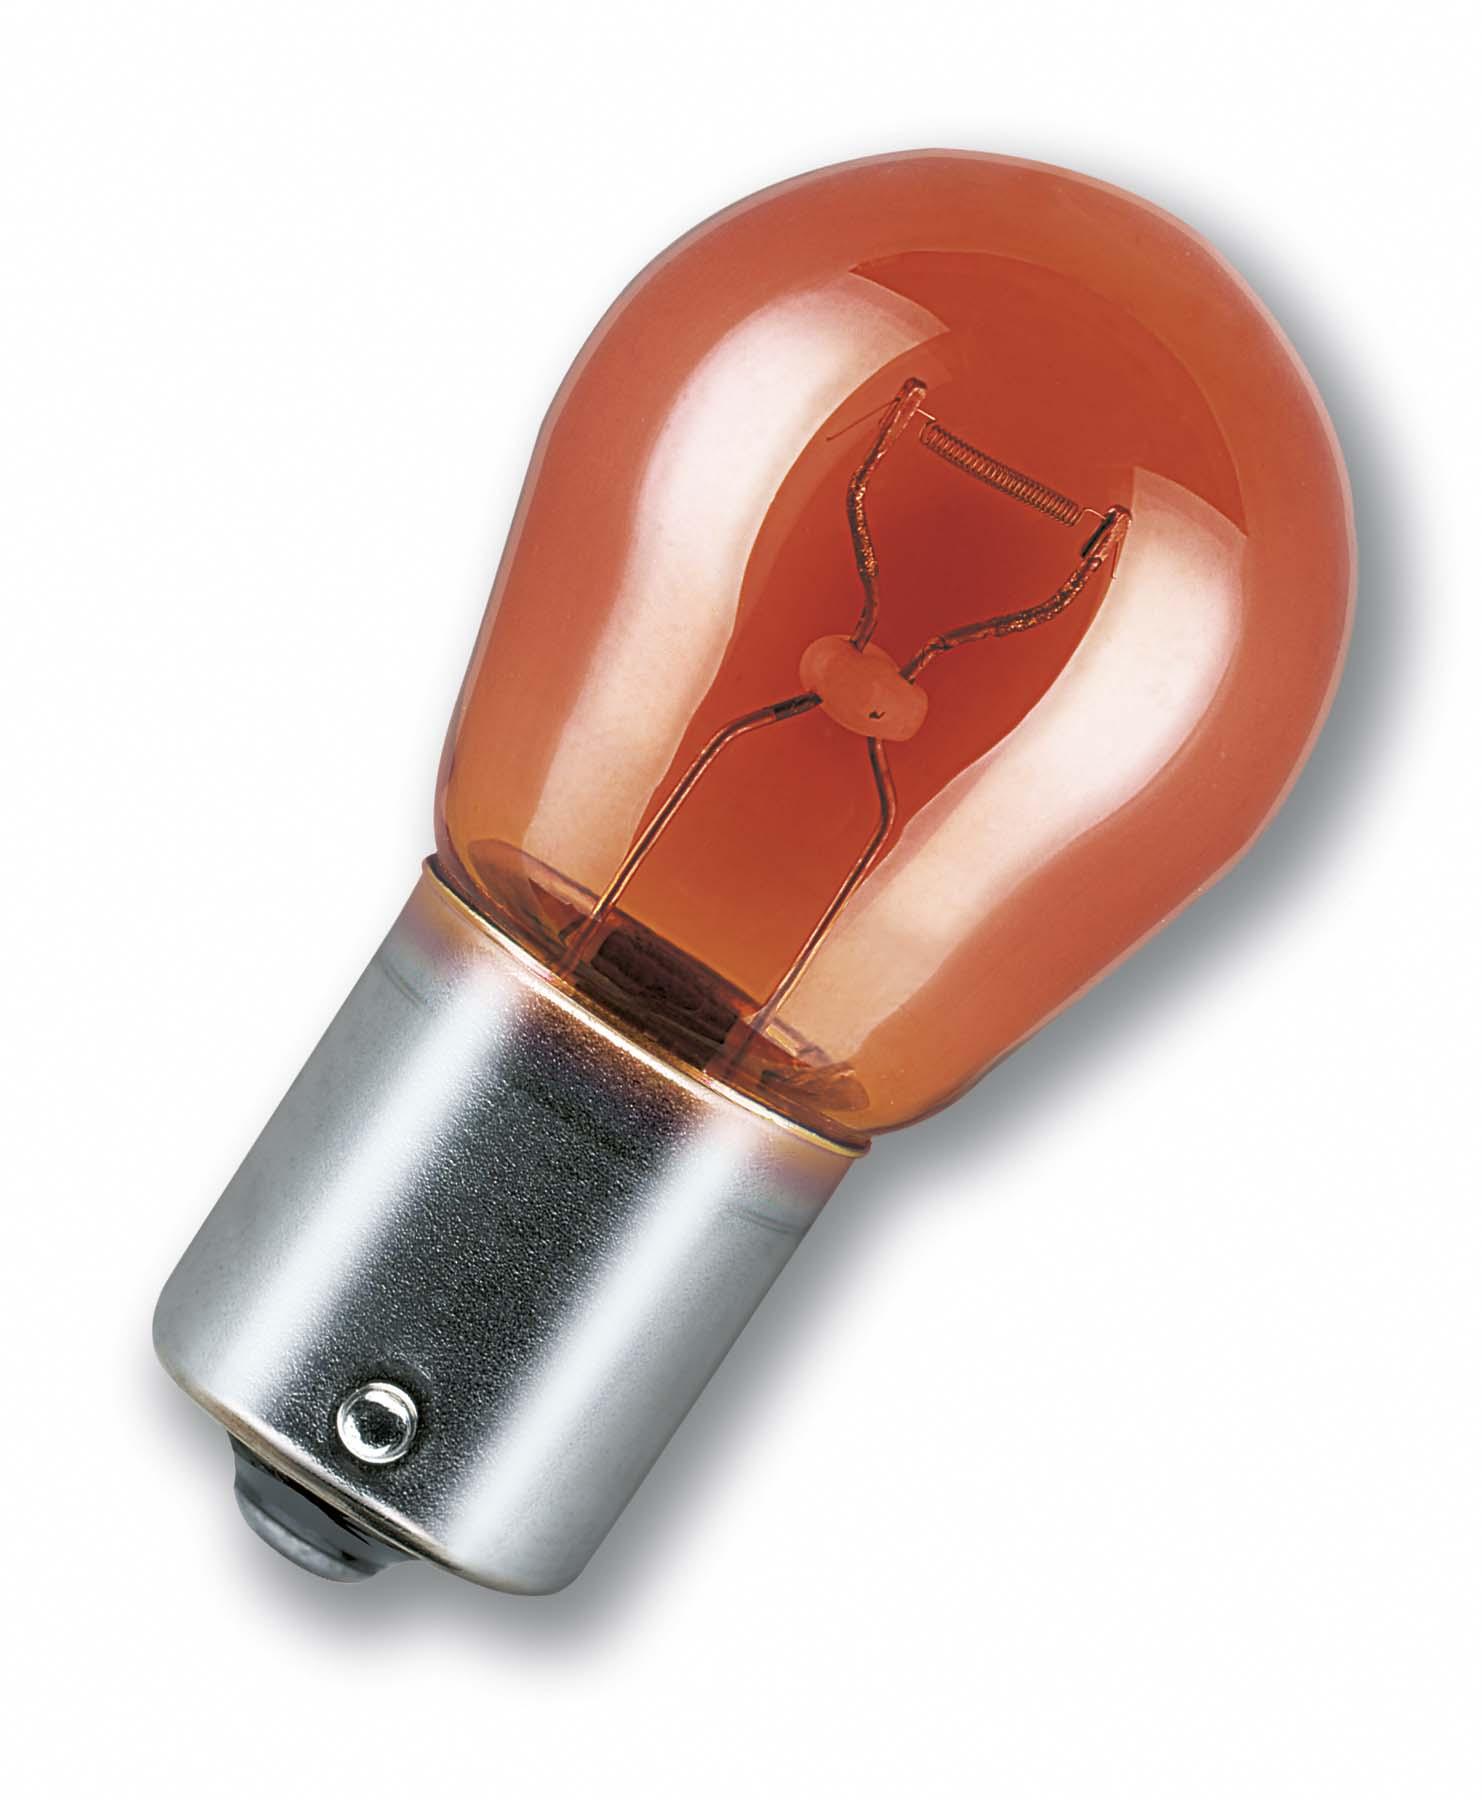 Ampoule PY21W Ultra Life 21W [12V] (2 pièces) | OSRAM